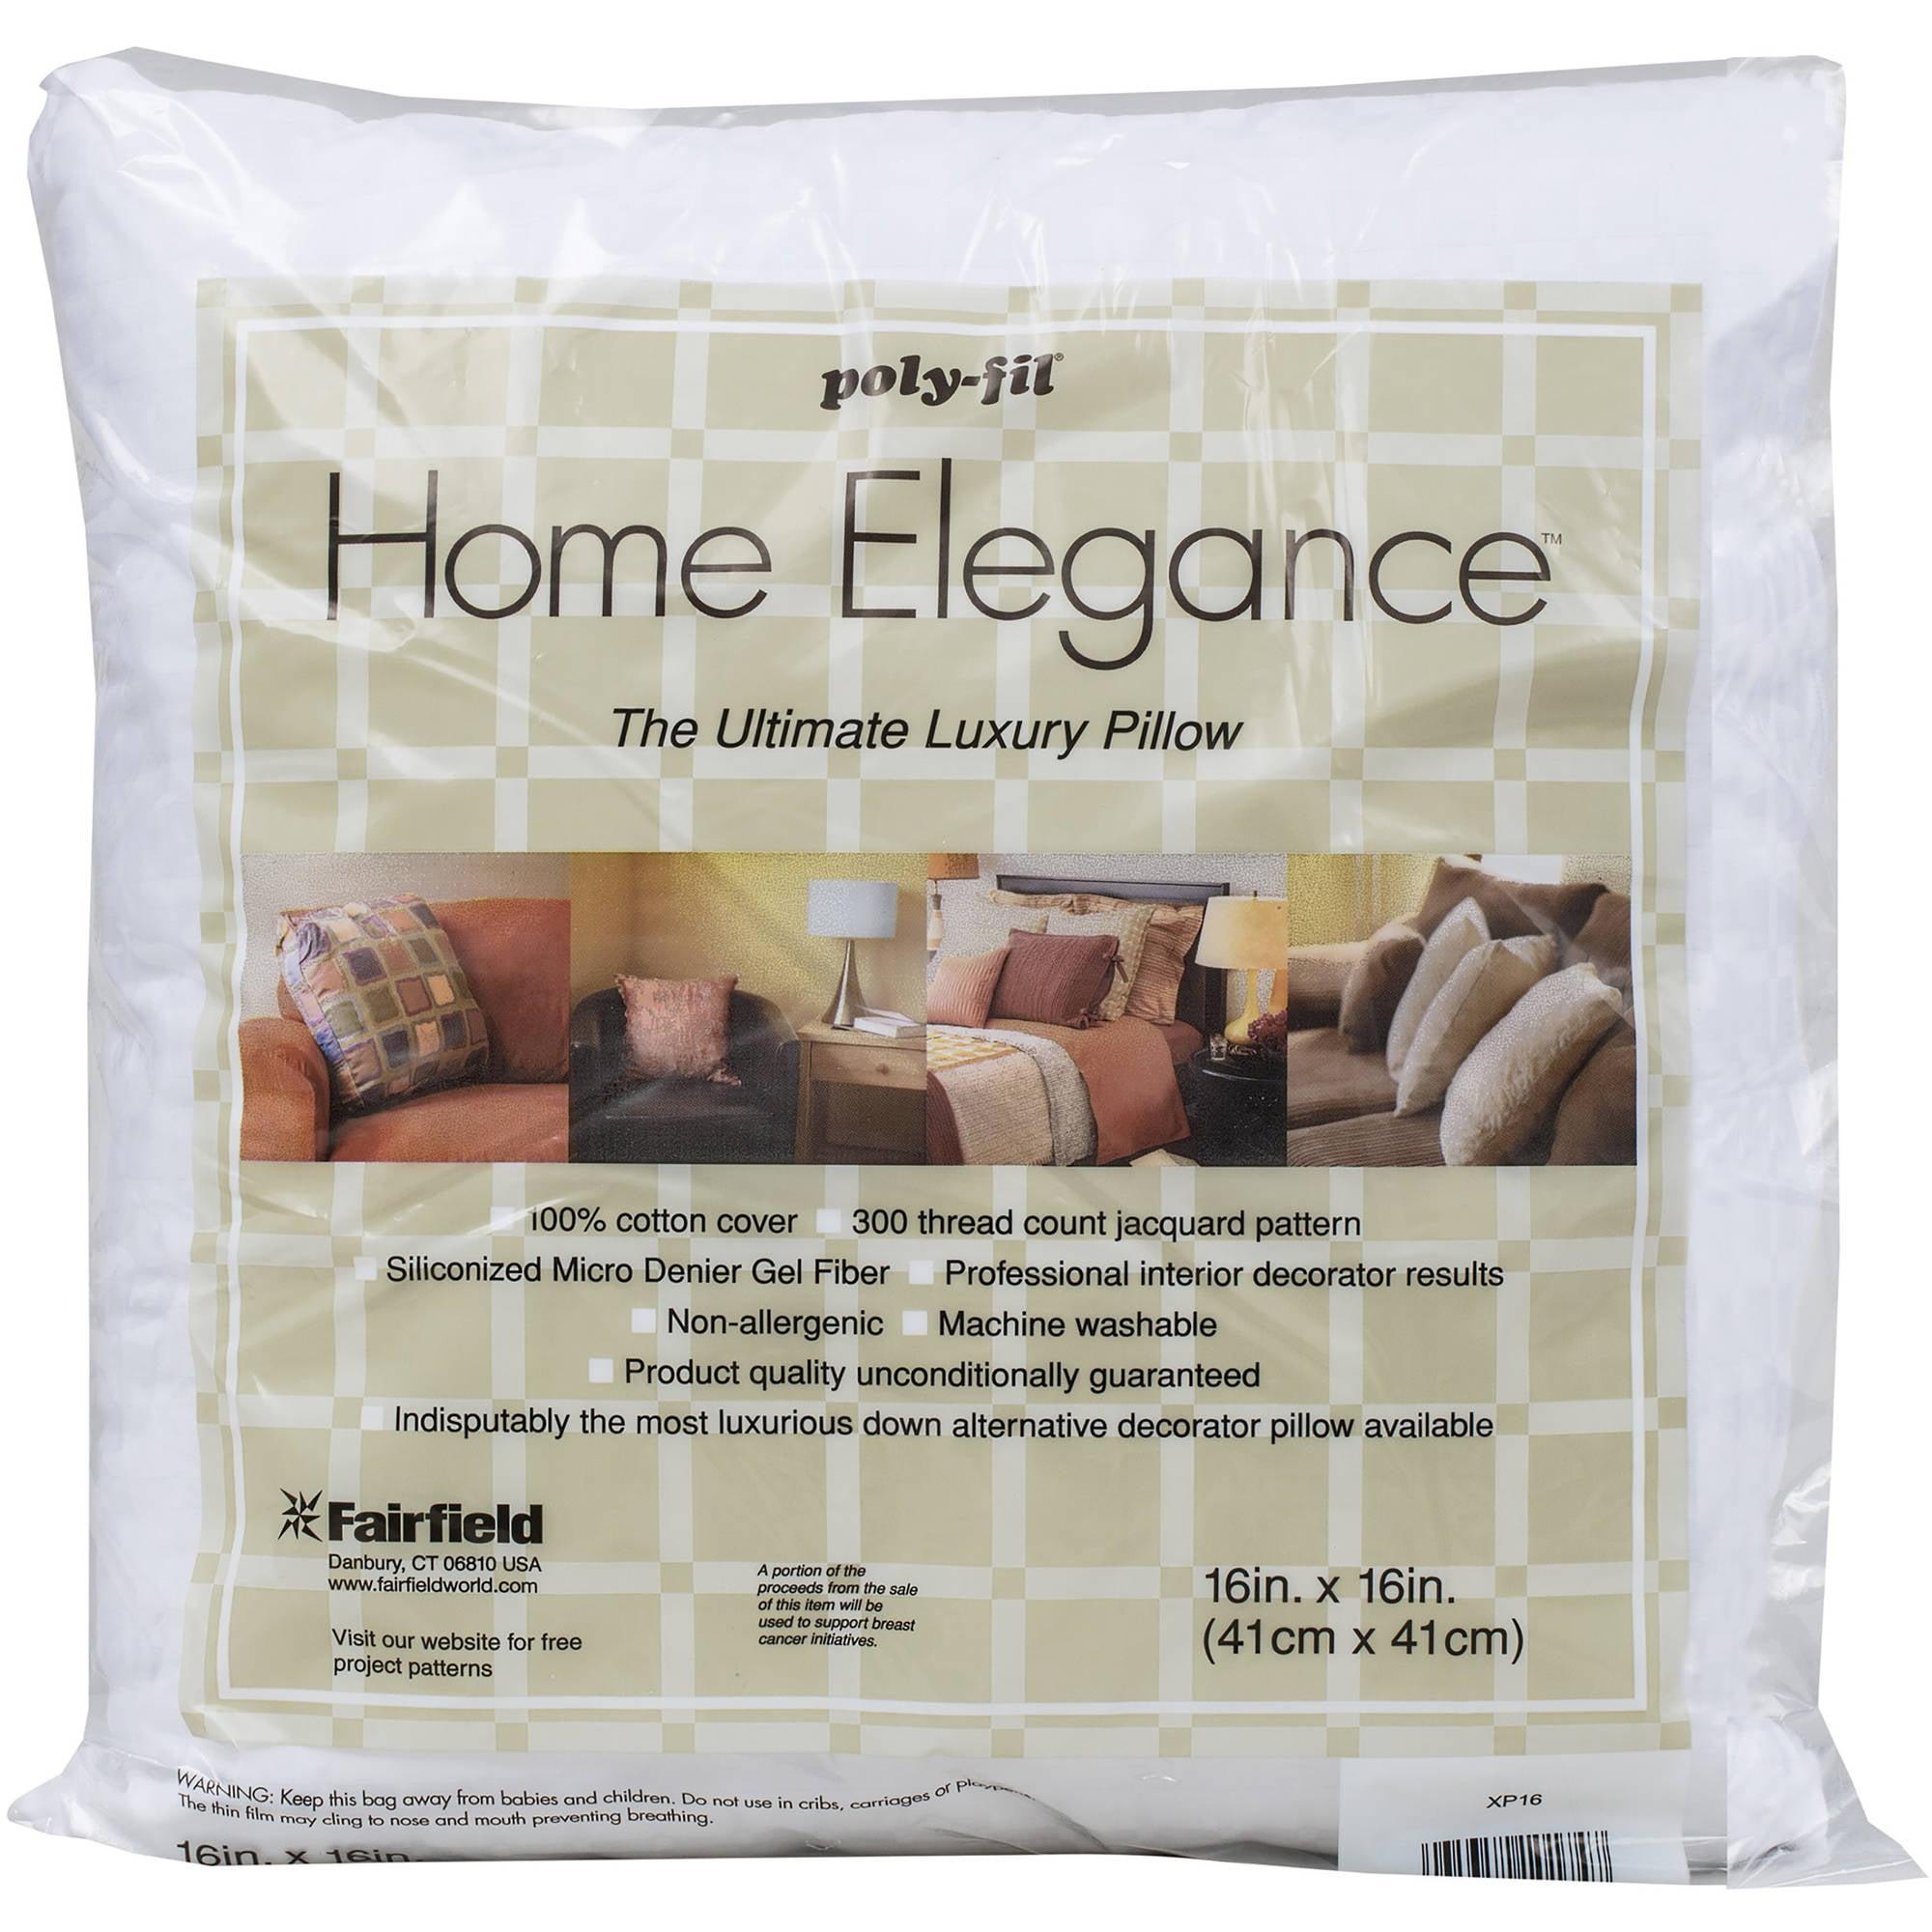 Home Elegance Pillow